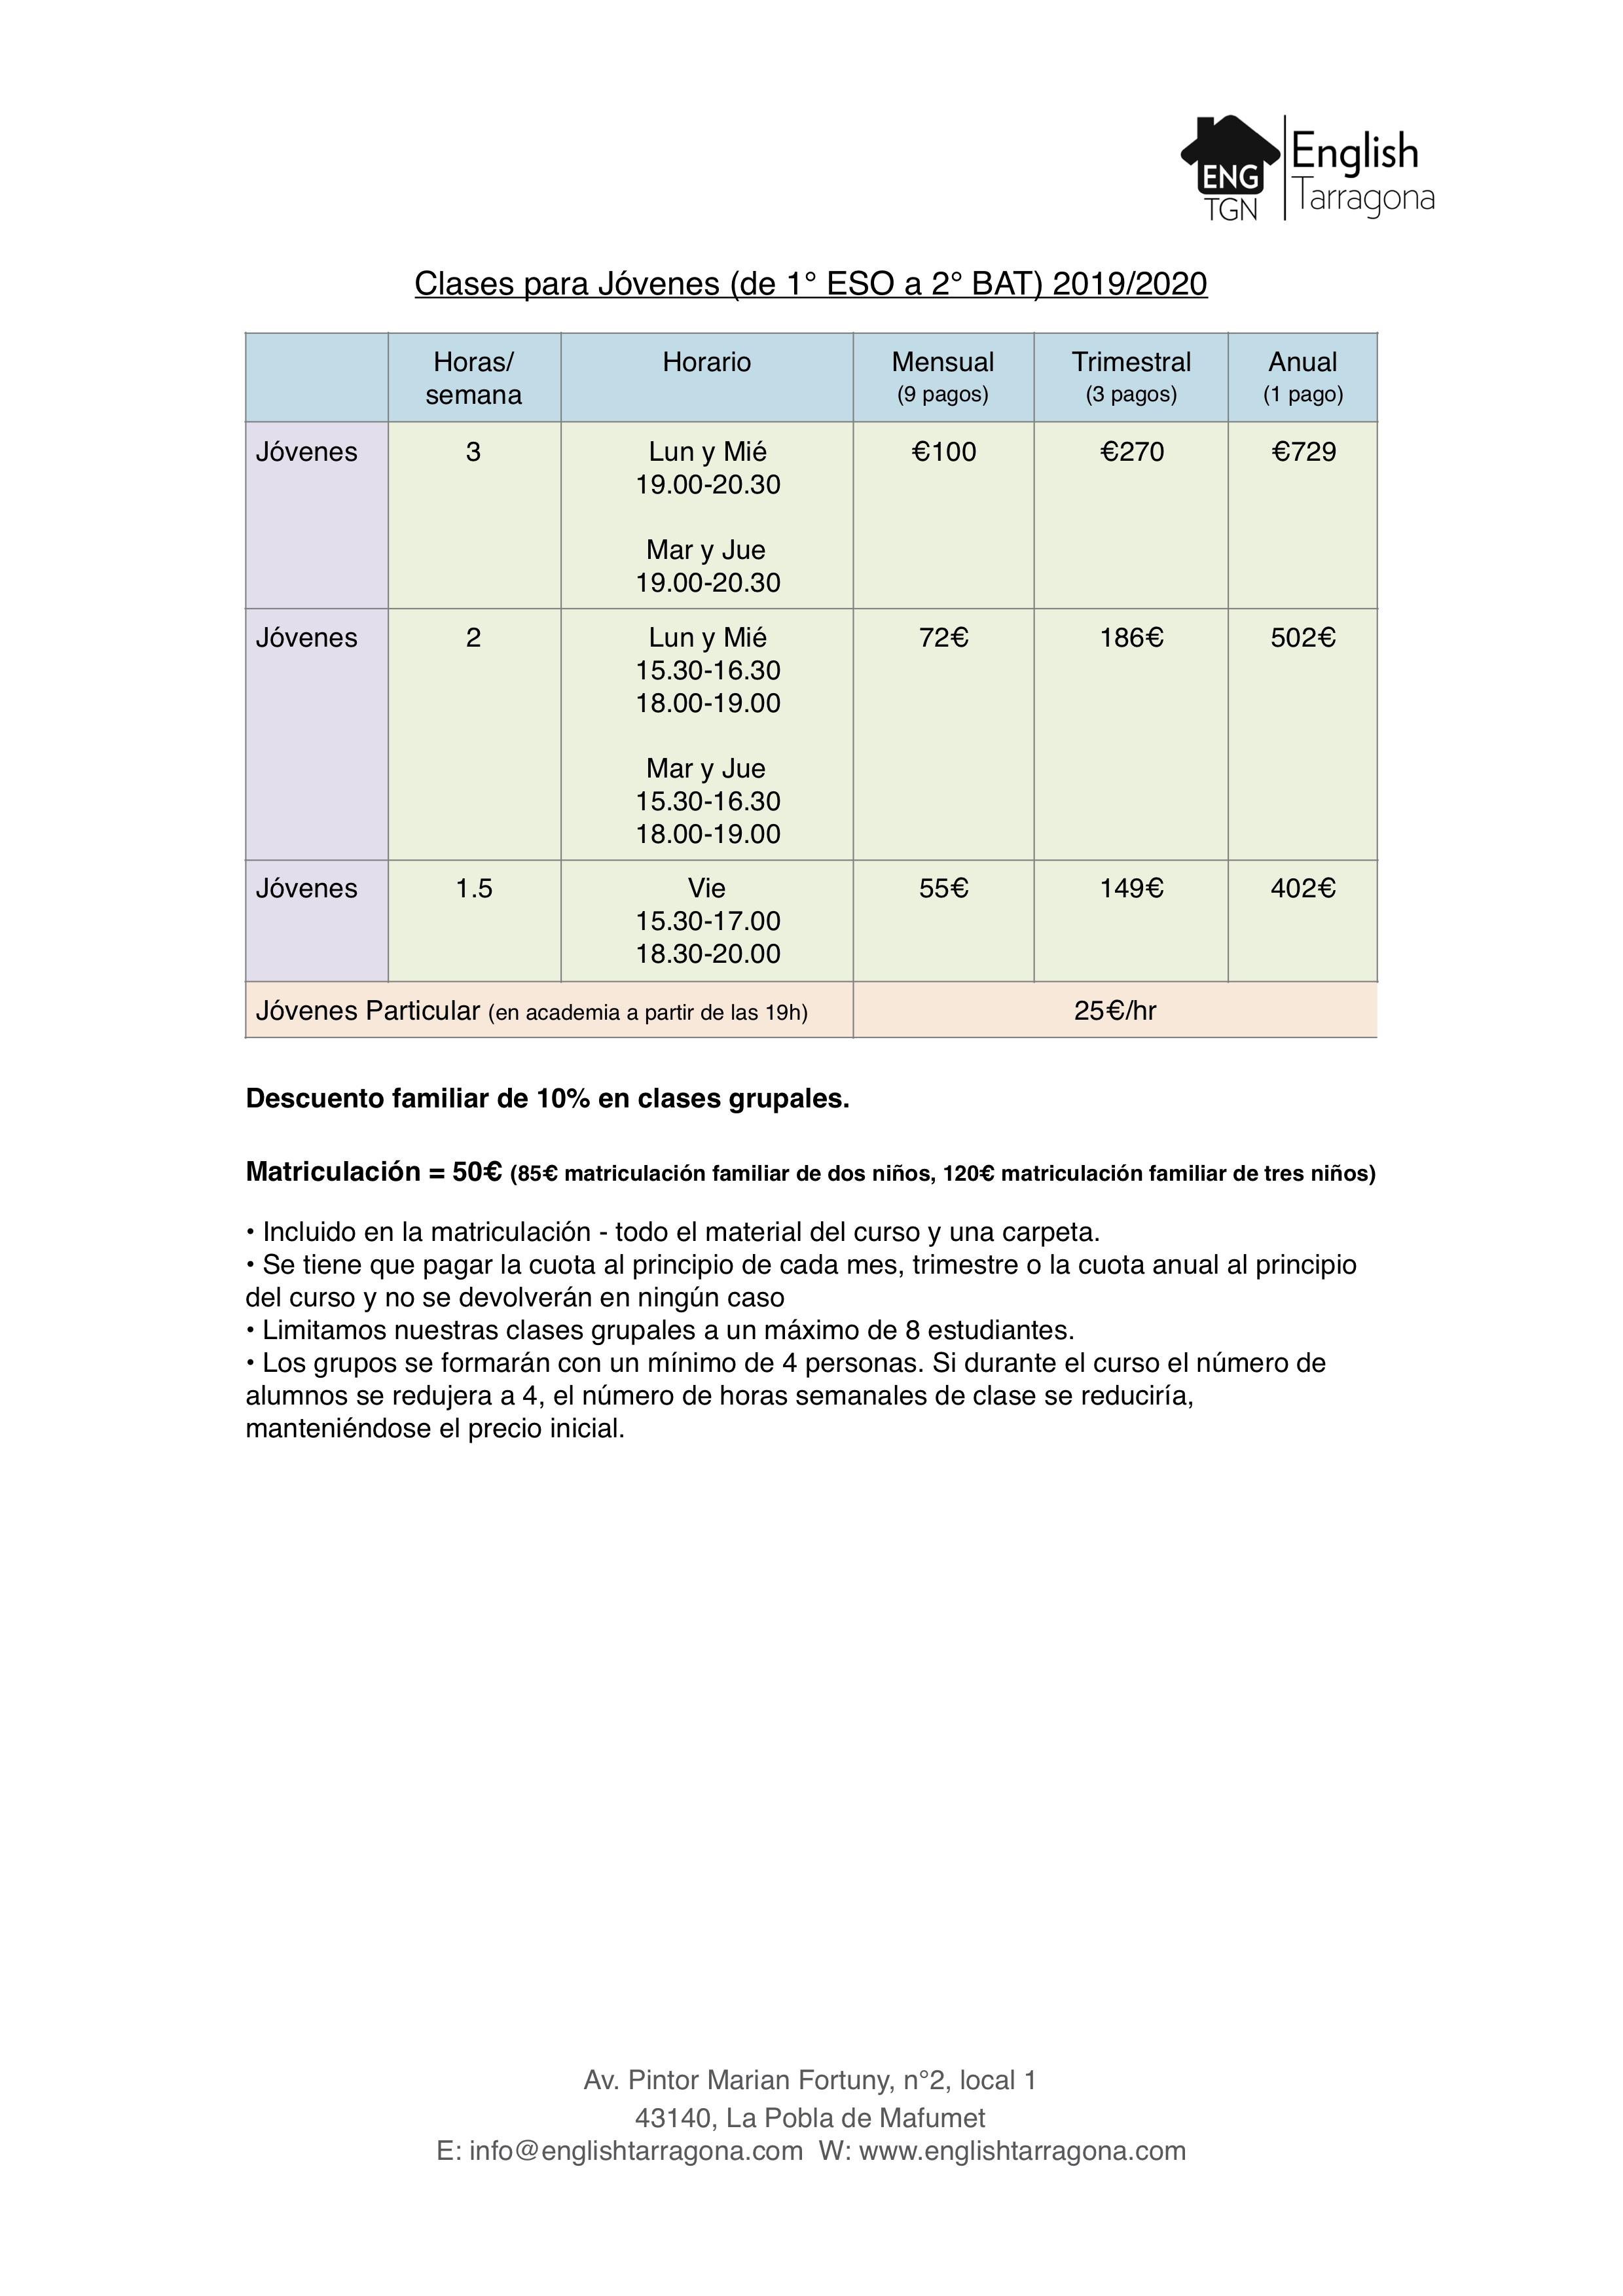 Prices Jóvenes La Pobla 2019:2020.jpg